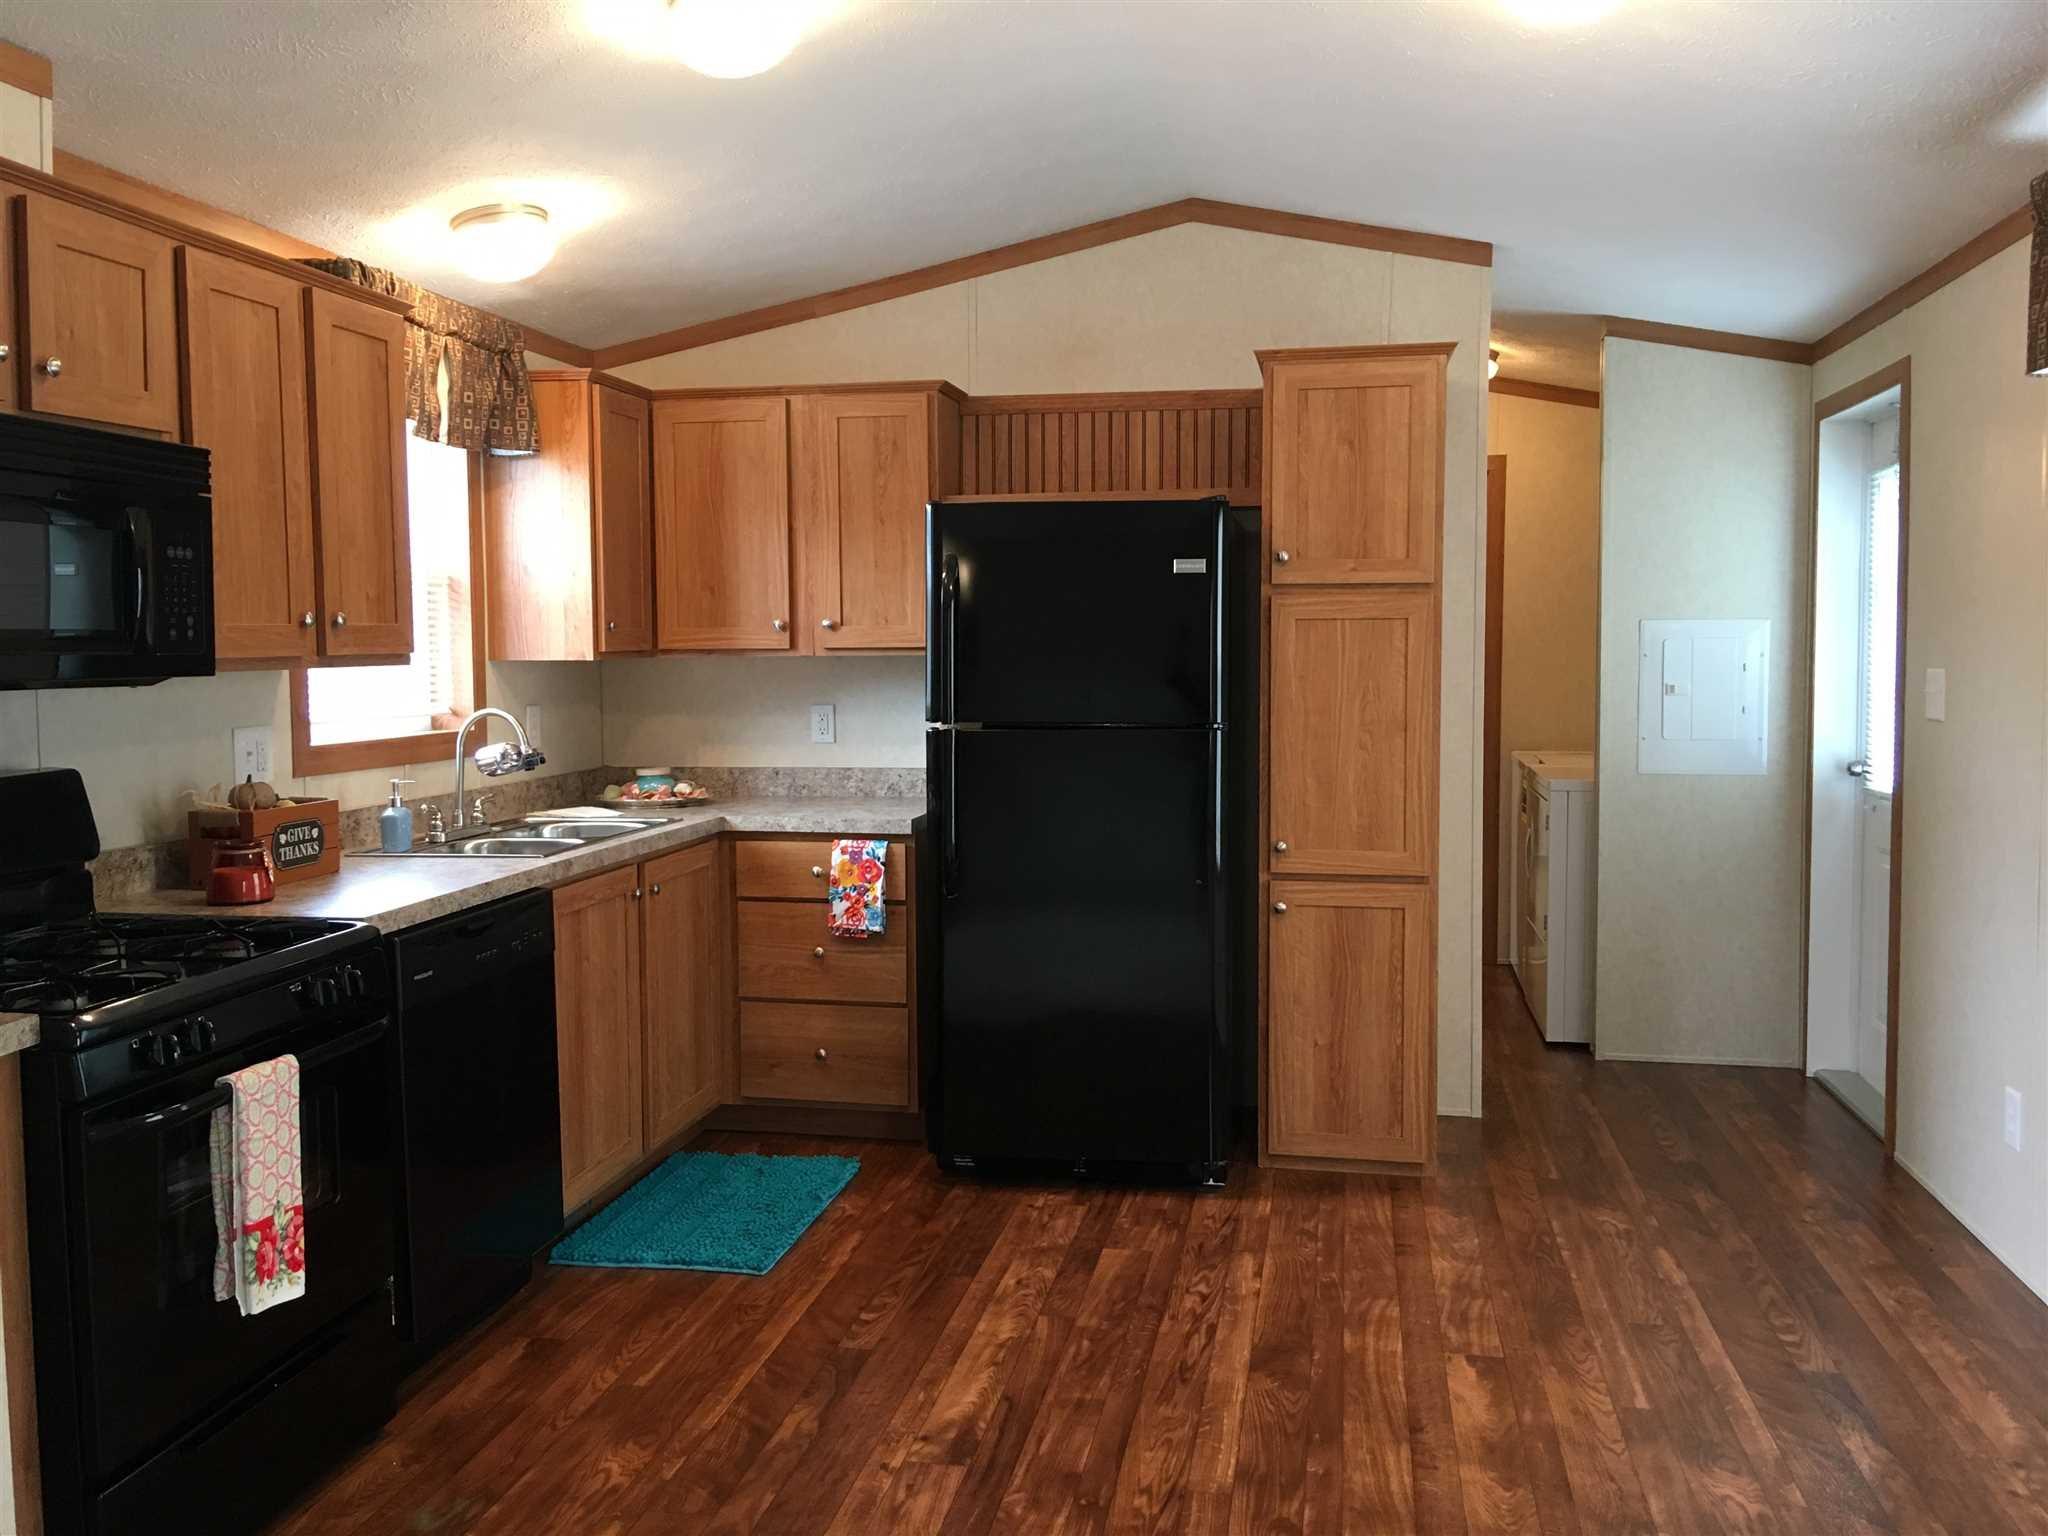 Single Family Home for Sale at 16 BIVONA LOT 12 LANE 16 BIVONA LOT 12 LANE New Windsor, New York 12553 United States